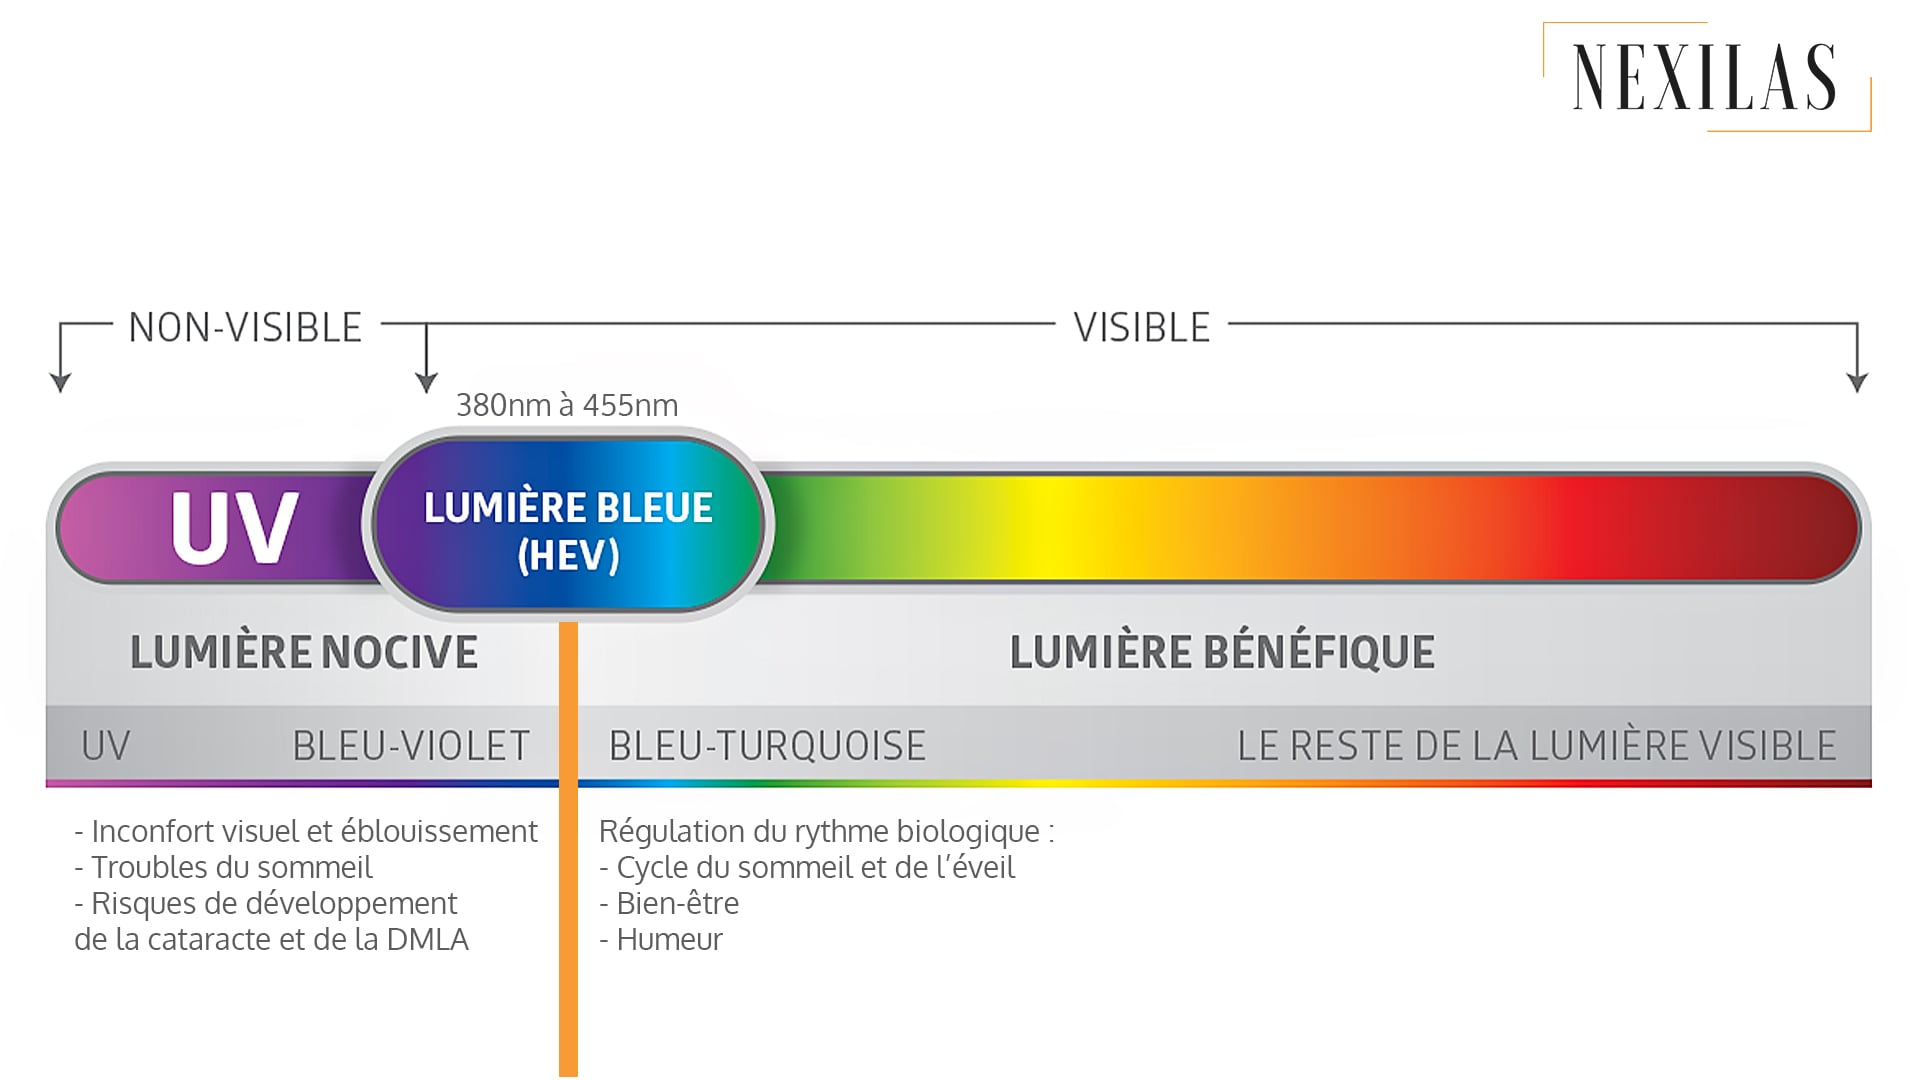 Nexilas spectre lumineux rvb lumiere bleue blog